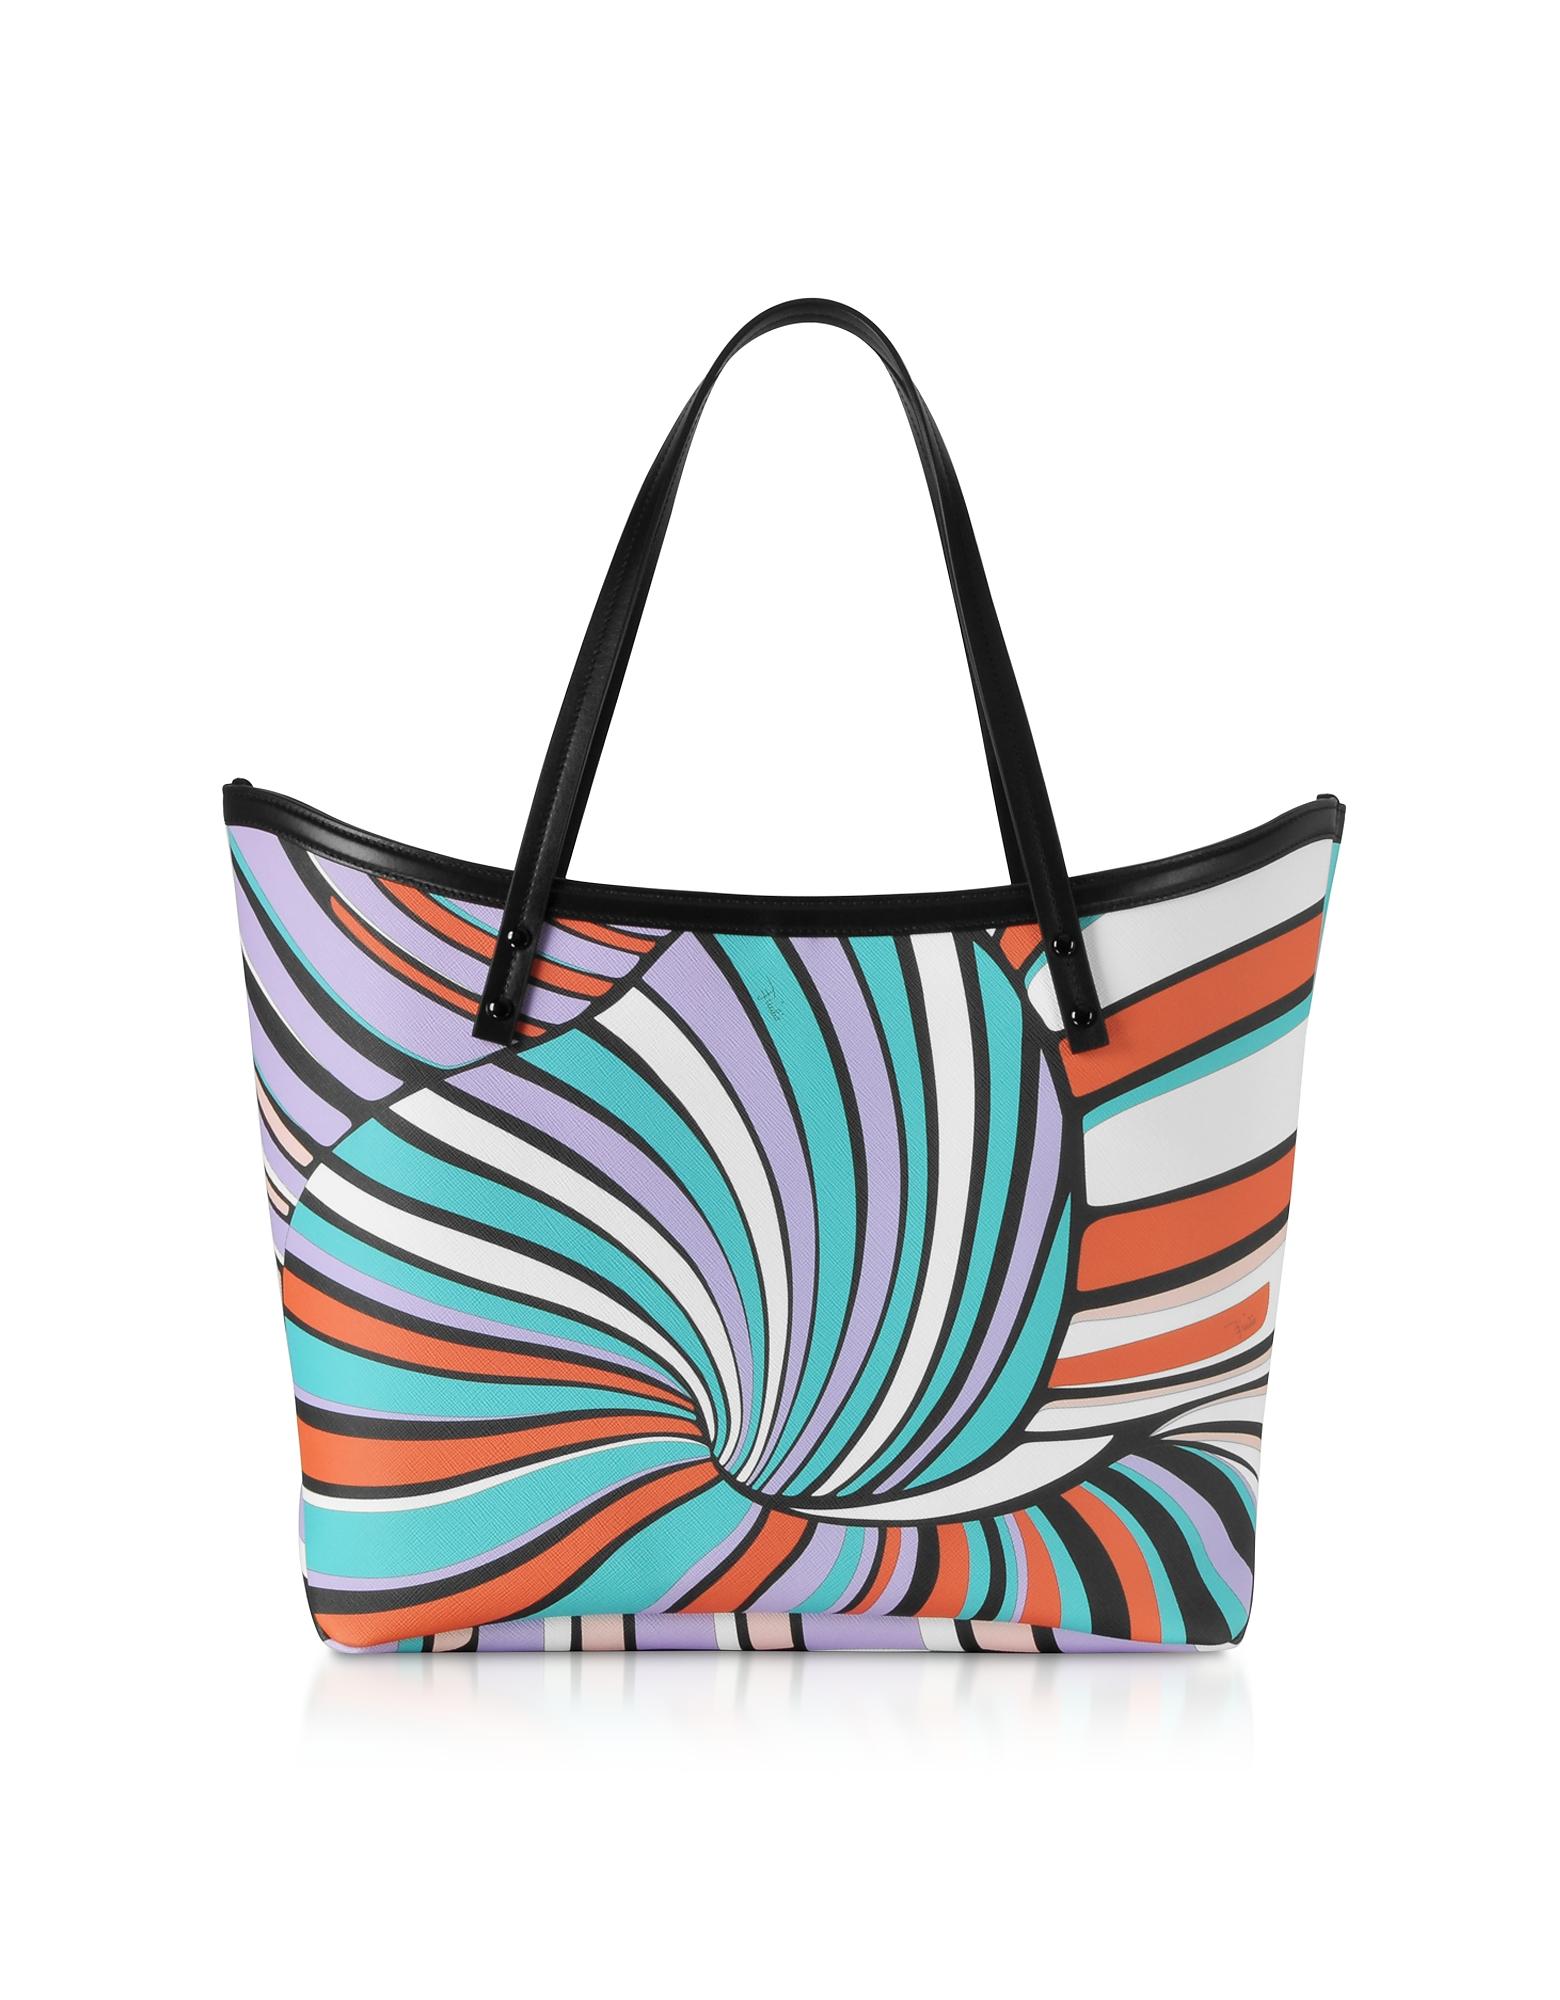 Lilac and Aqua Tote Bag w/Pouch